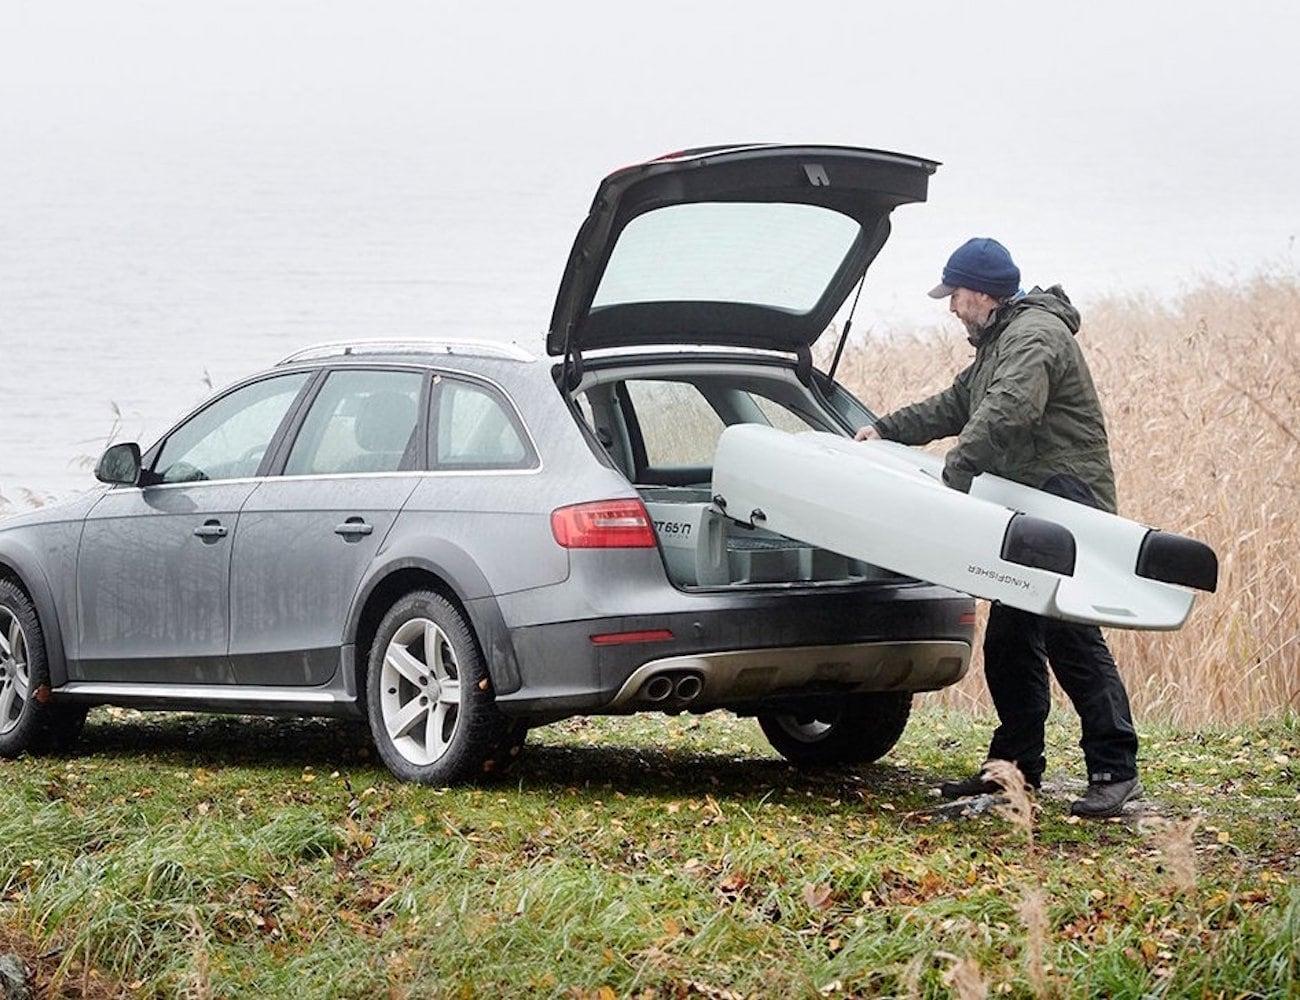 KingFisher Modular Trimaran Fishing Kayak fits right in your car